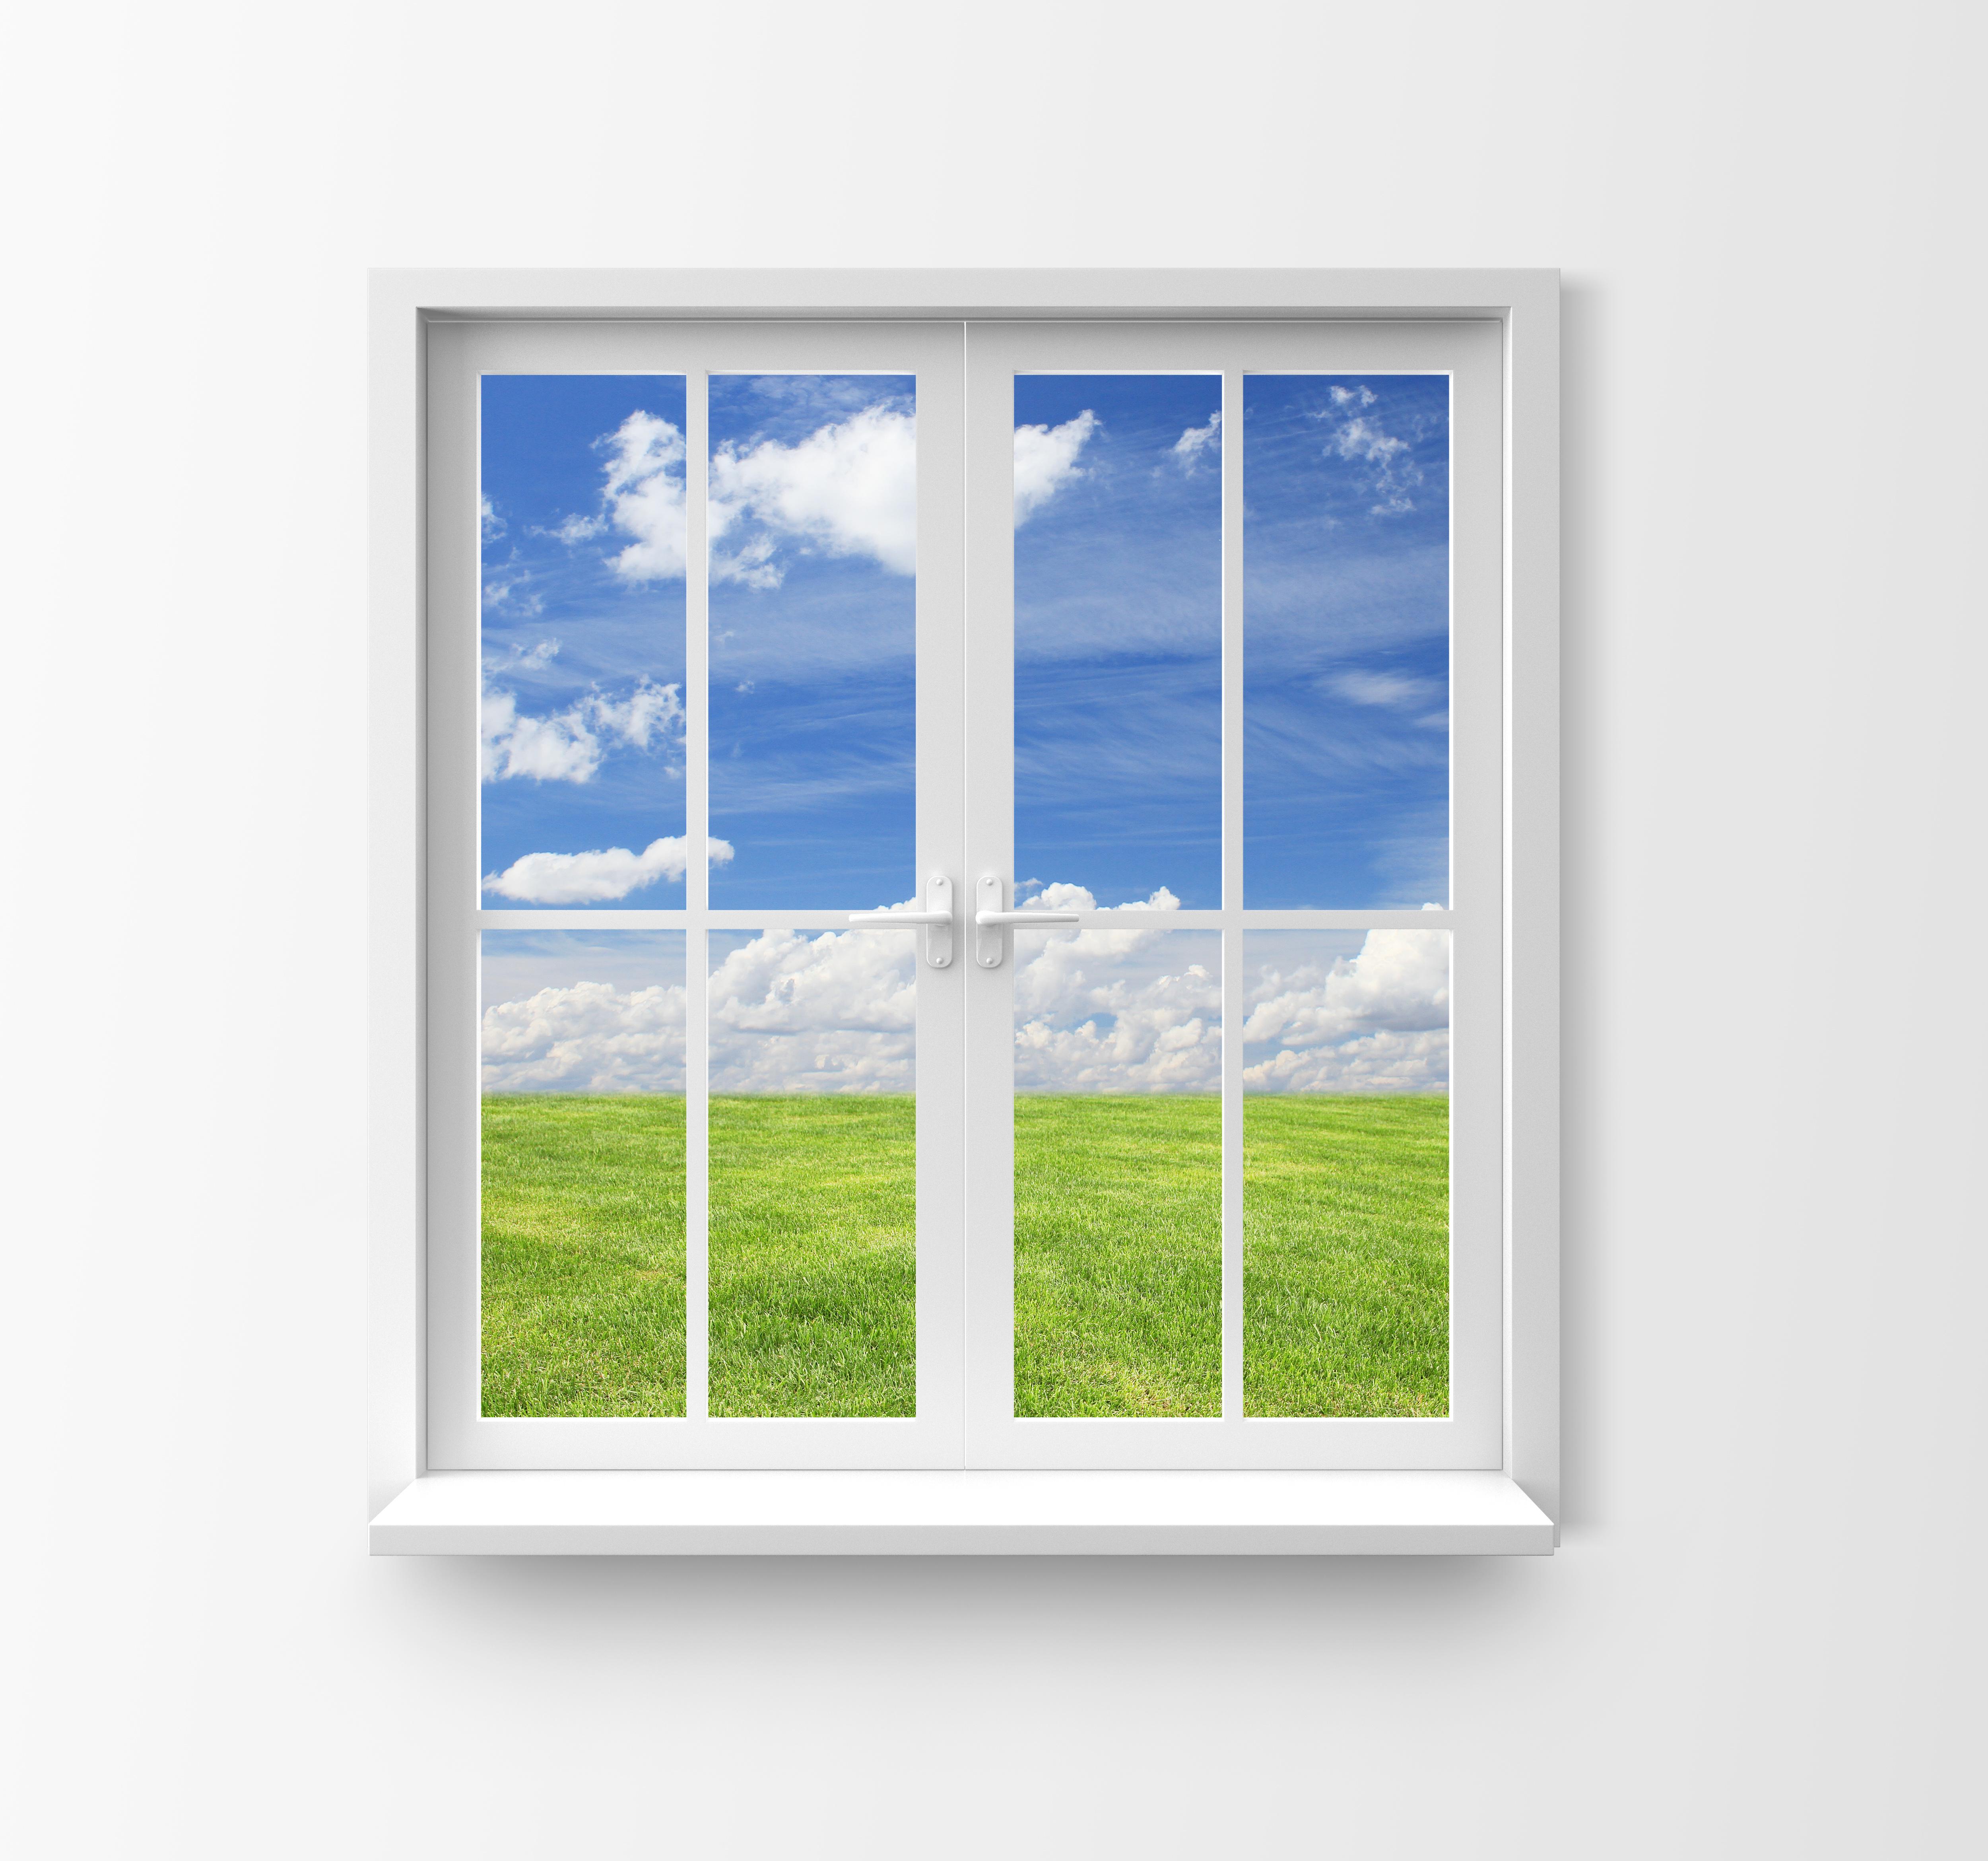 High Resolution Wallpaper | Window 5000x4680 px